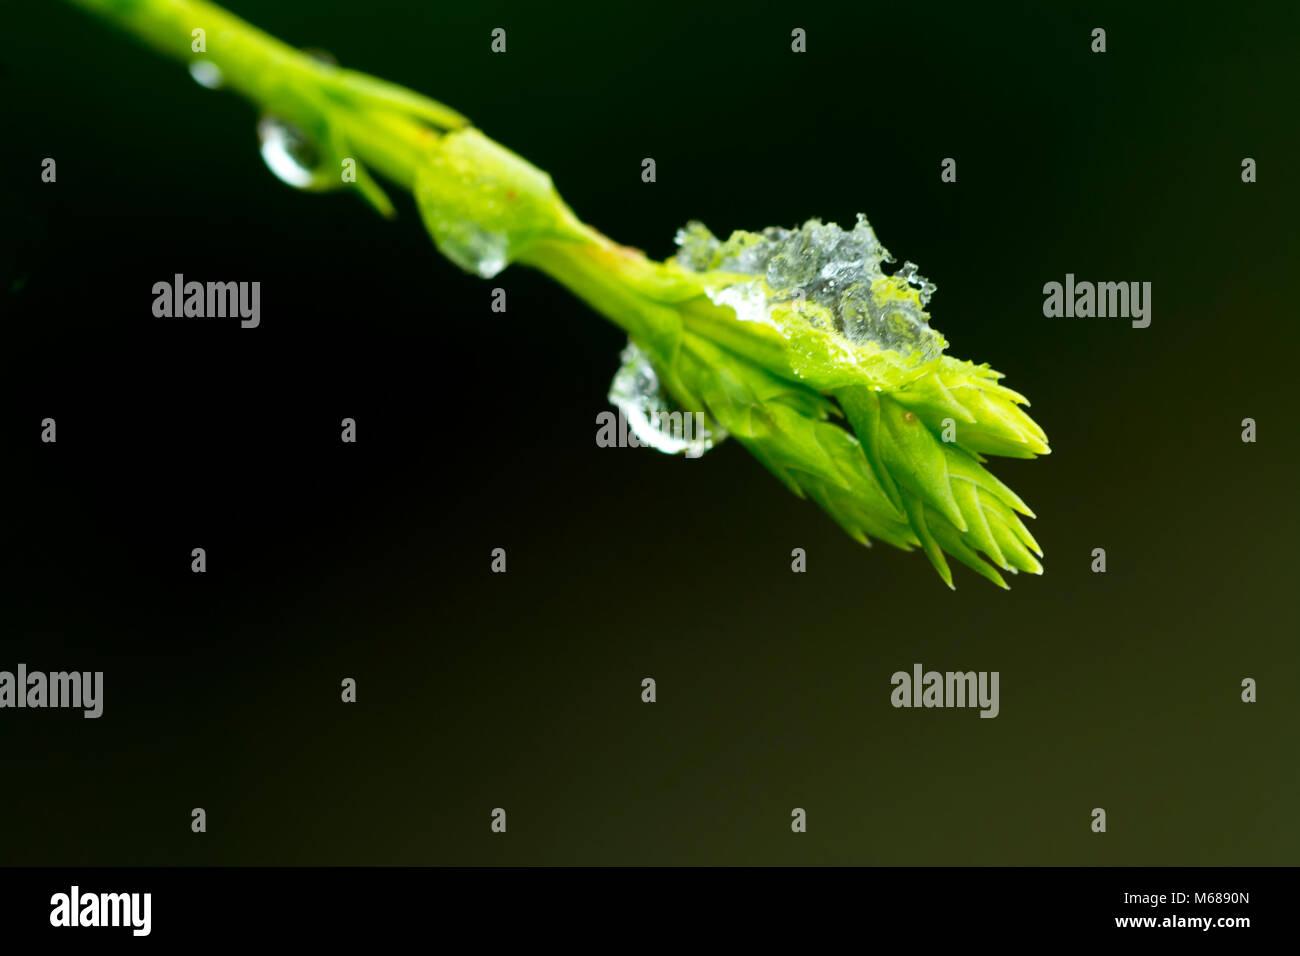 Ice formation on Leylandii Hedge branch tip - Stock Image